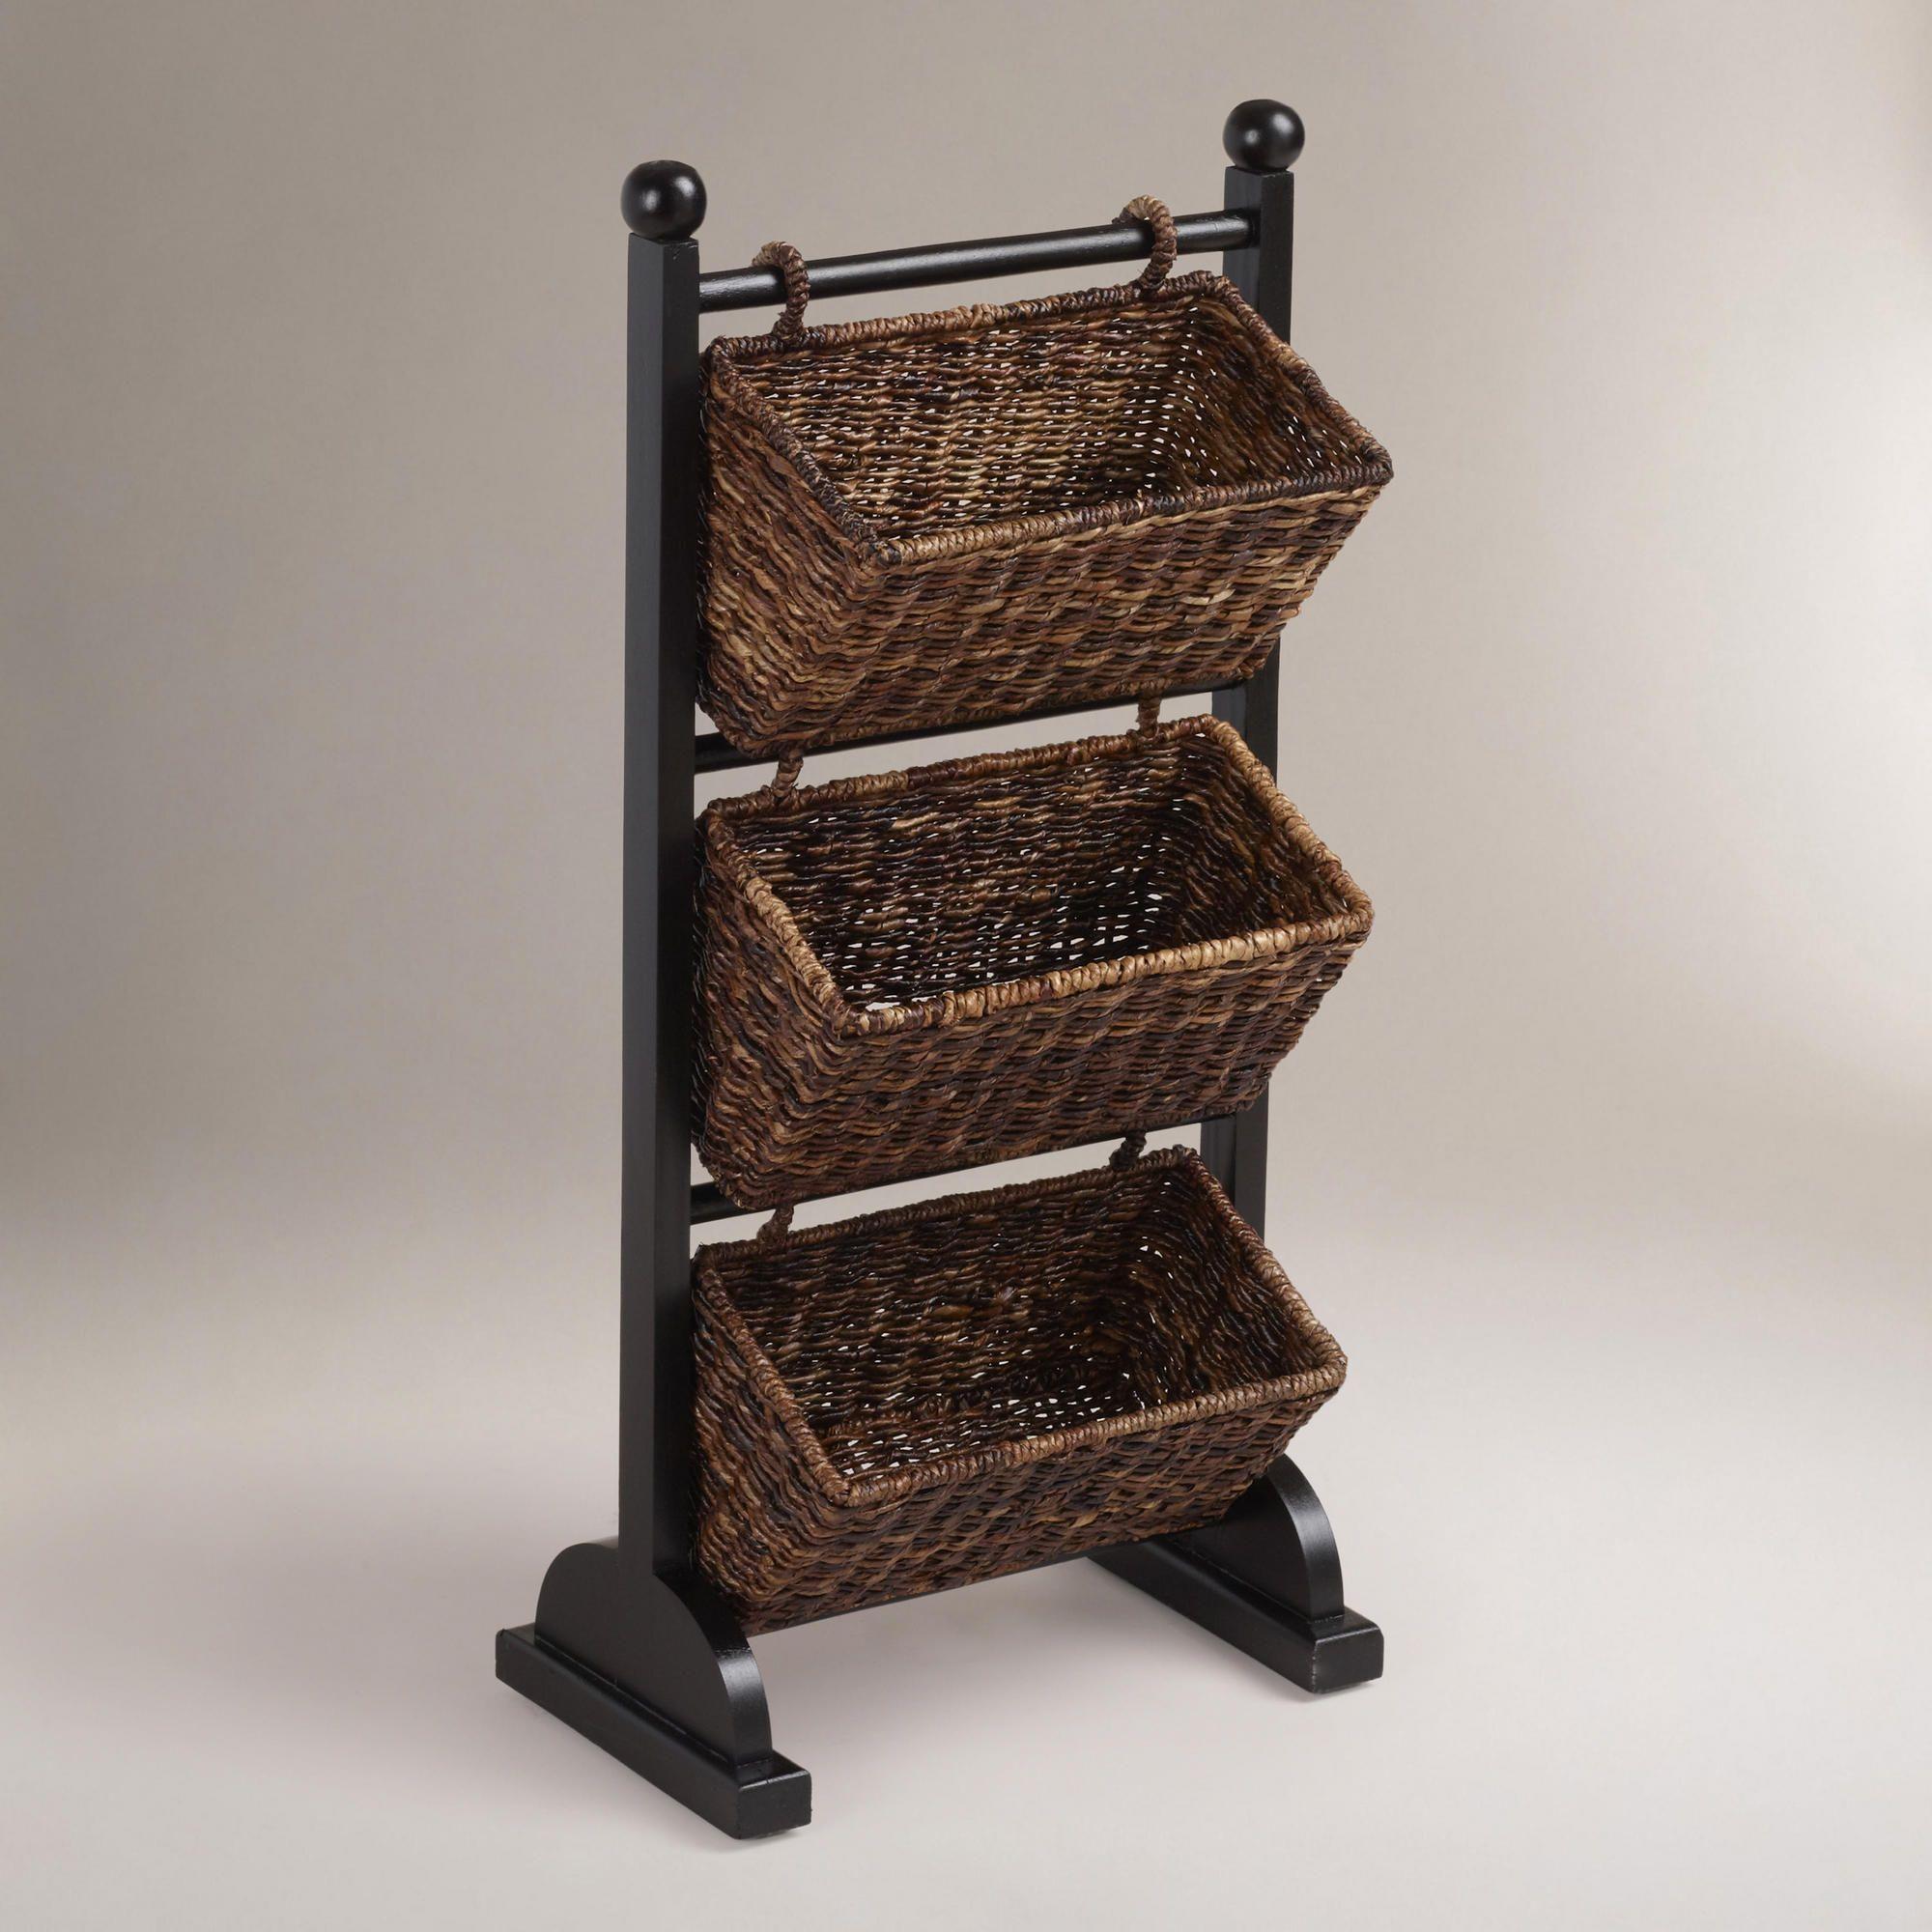 Madras Storage Baskets: 3-Tier Madras Cubby